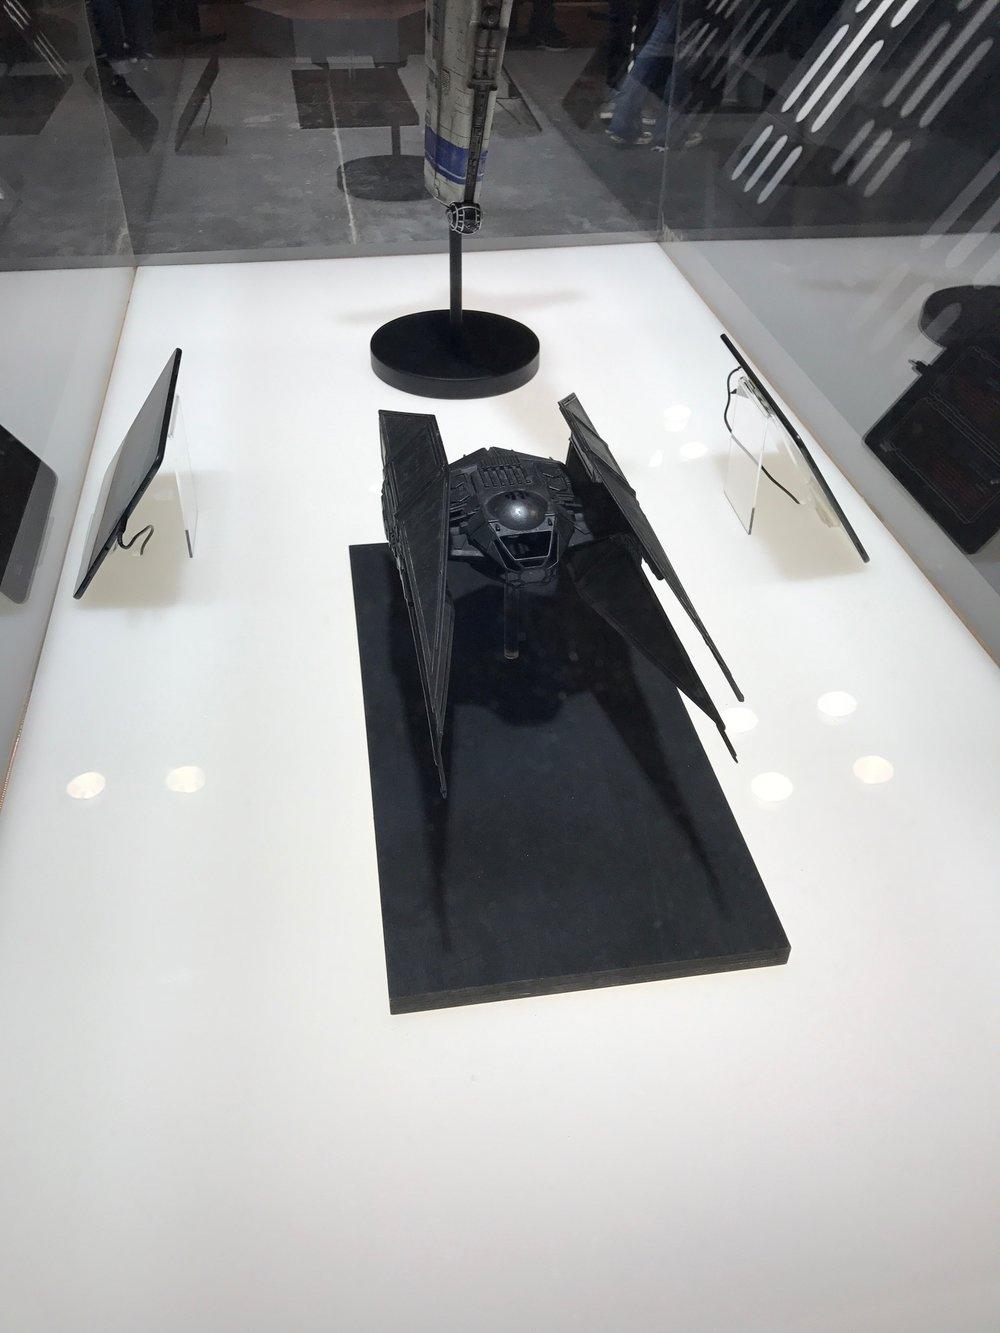 Verizon Booth-NYCC10.jpeg